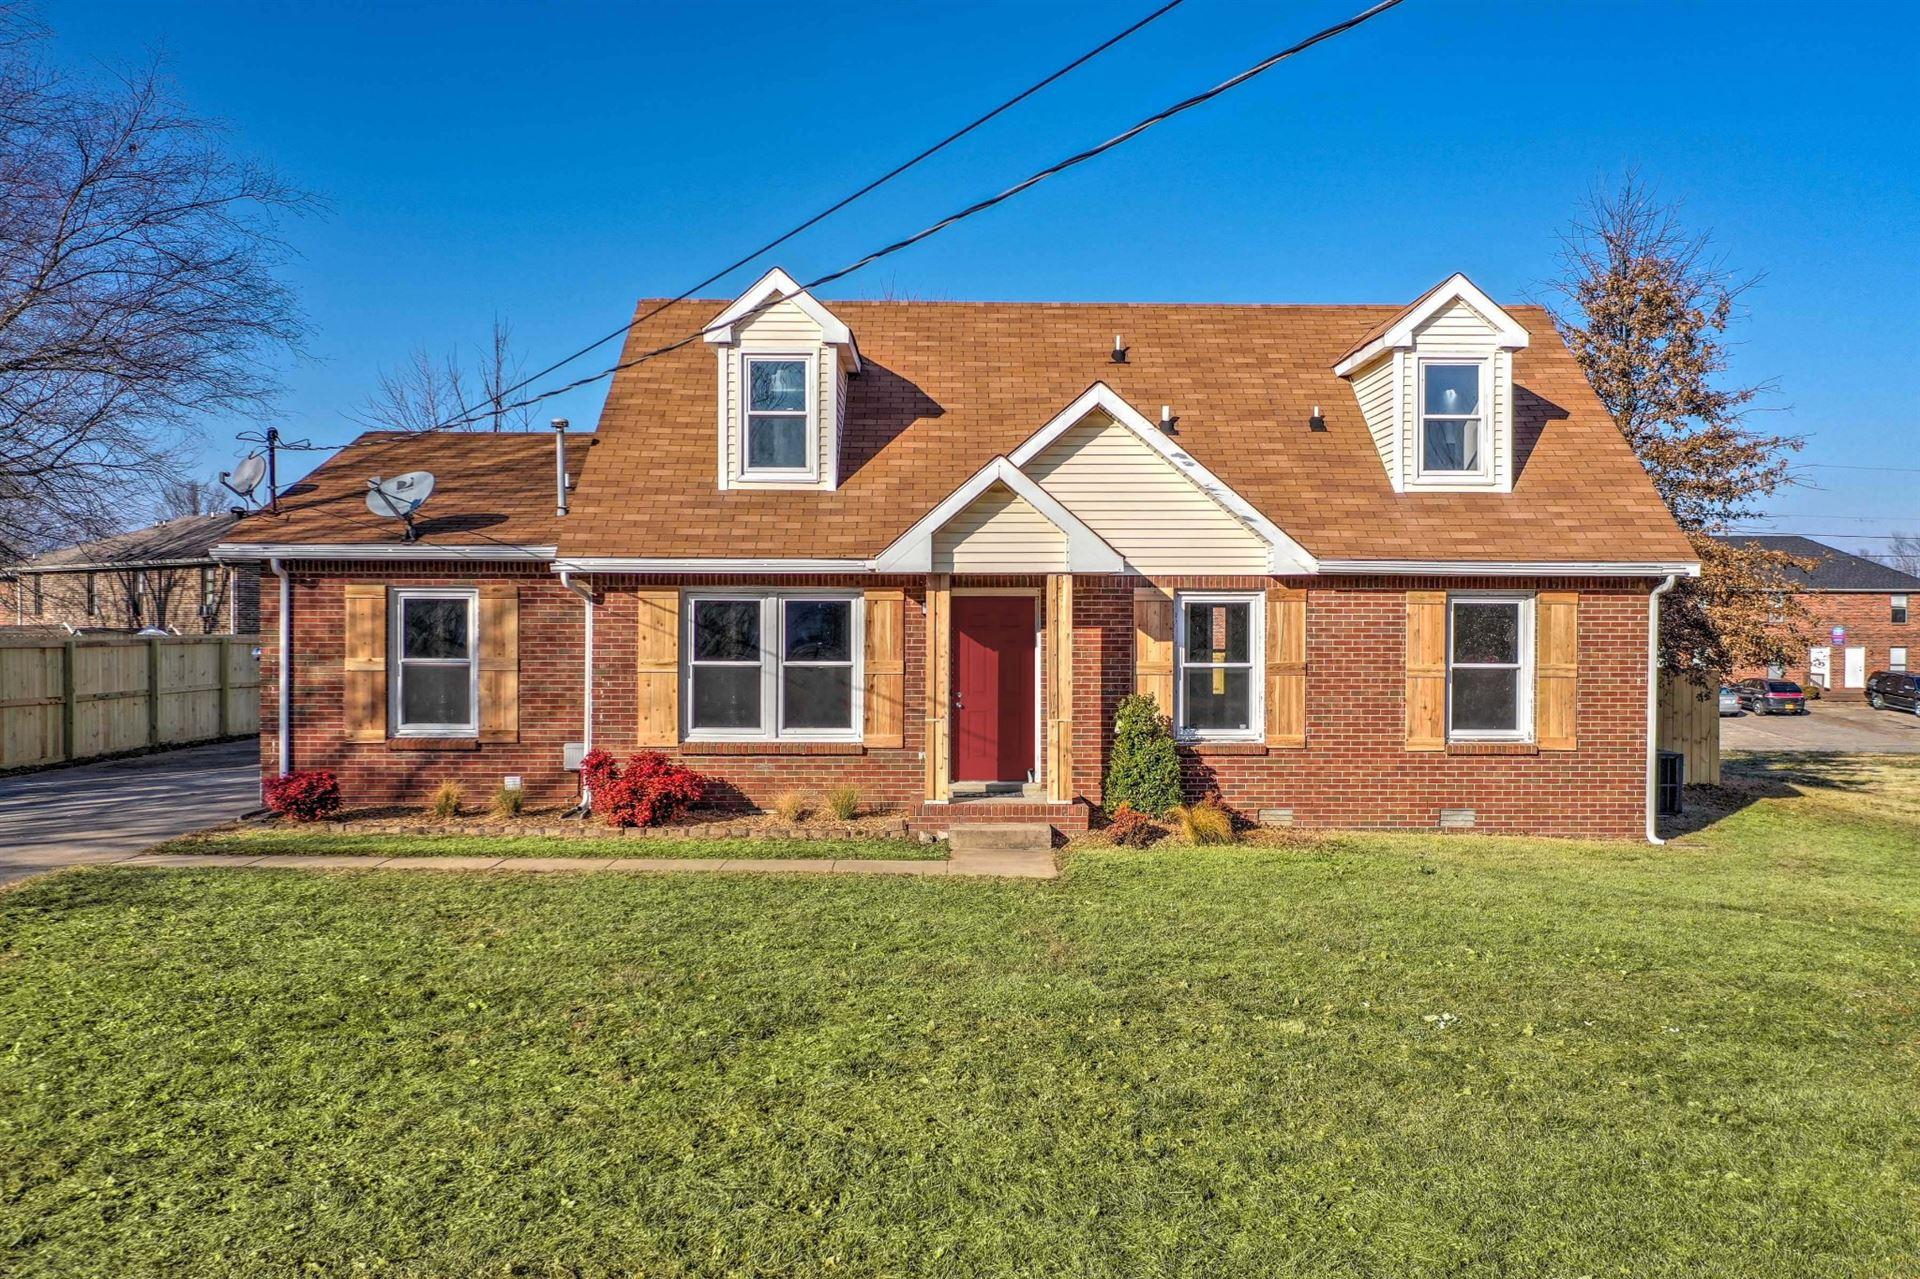 293 Northridge Dr, Clarksville, TN 37042 - MLS#: 2220503